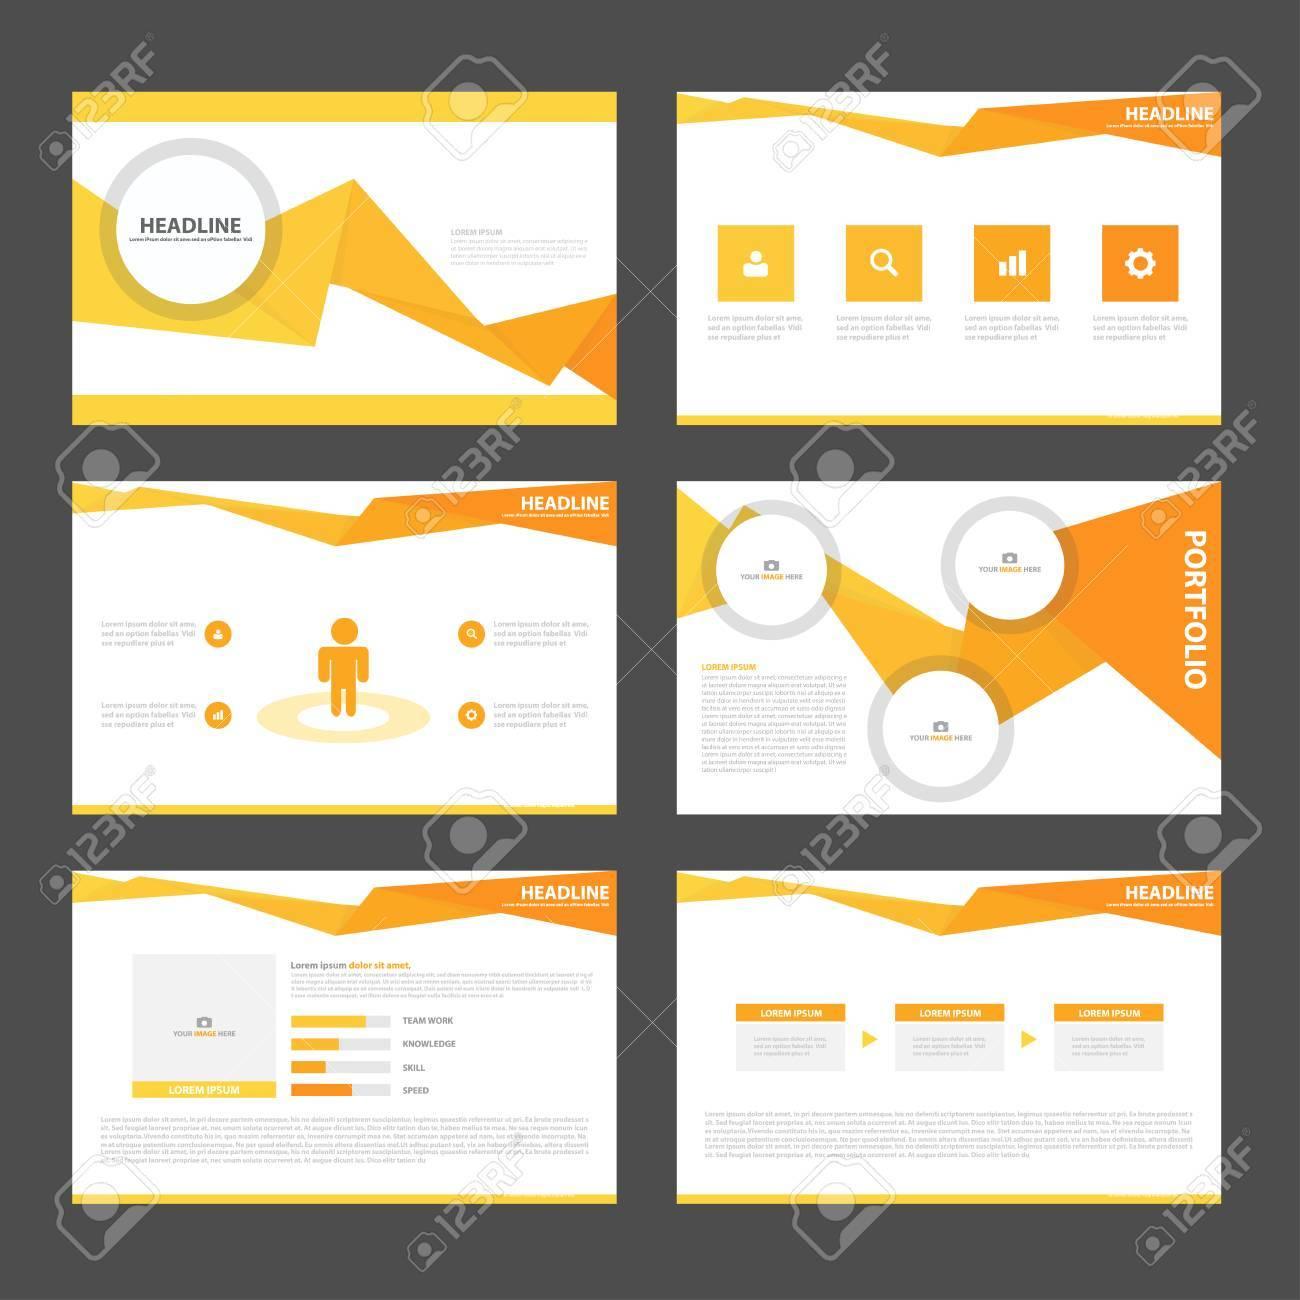 orange presentation templates infographic elements flat design orange presentation templates infographic elements flat design set for brochure leaflet marketing advertising stock vector